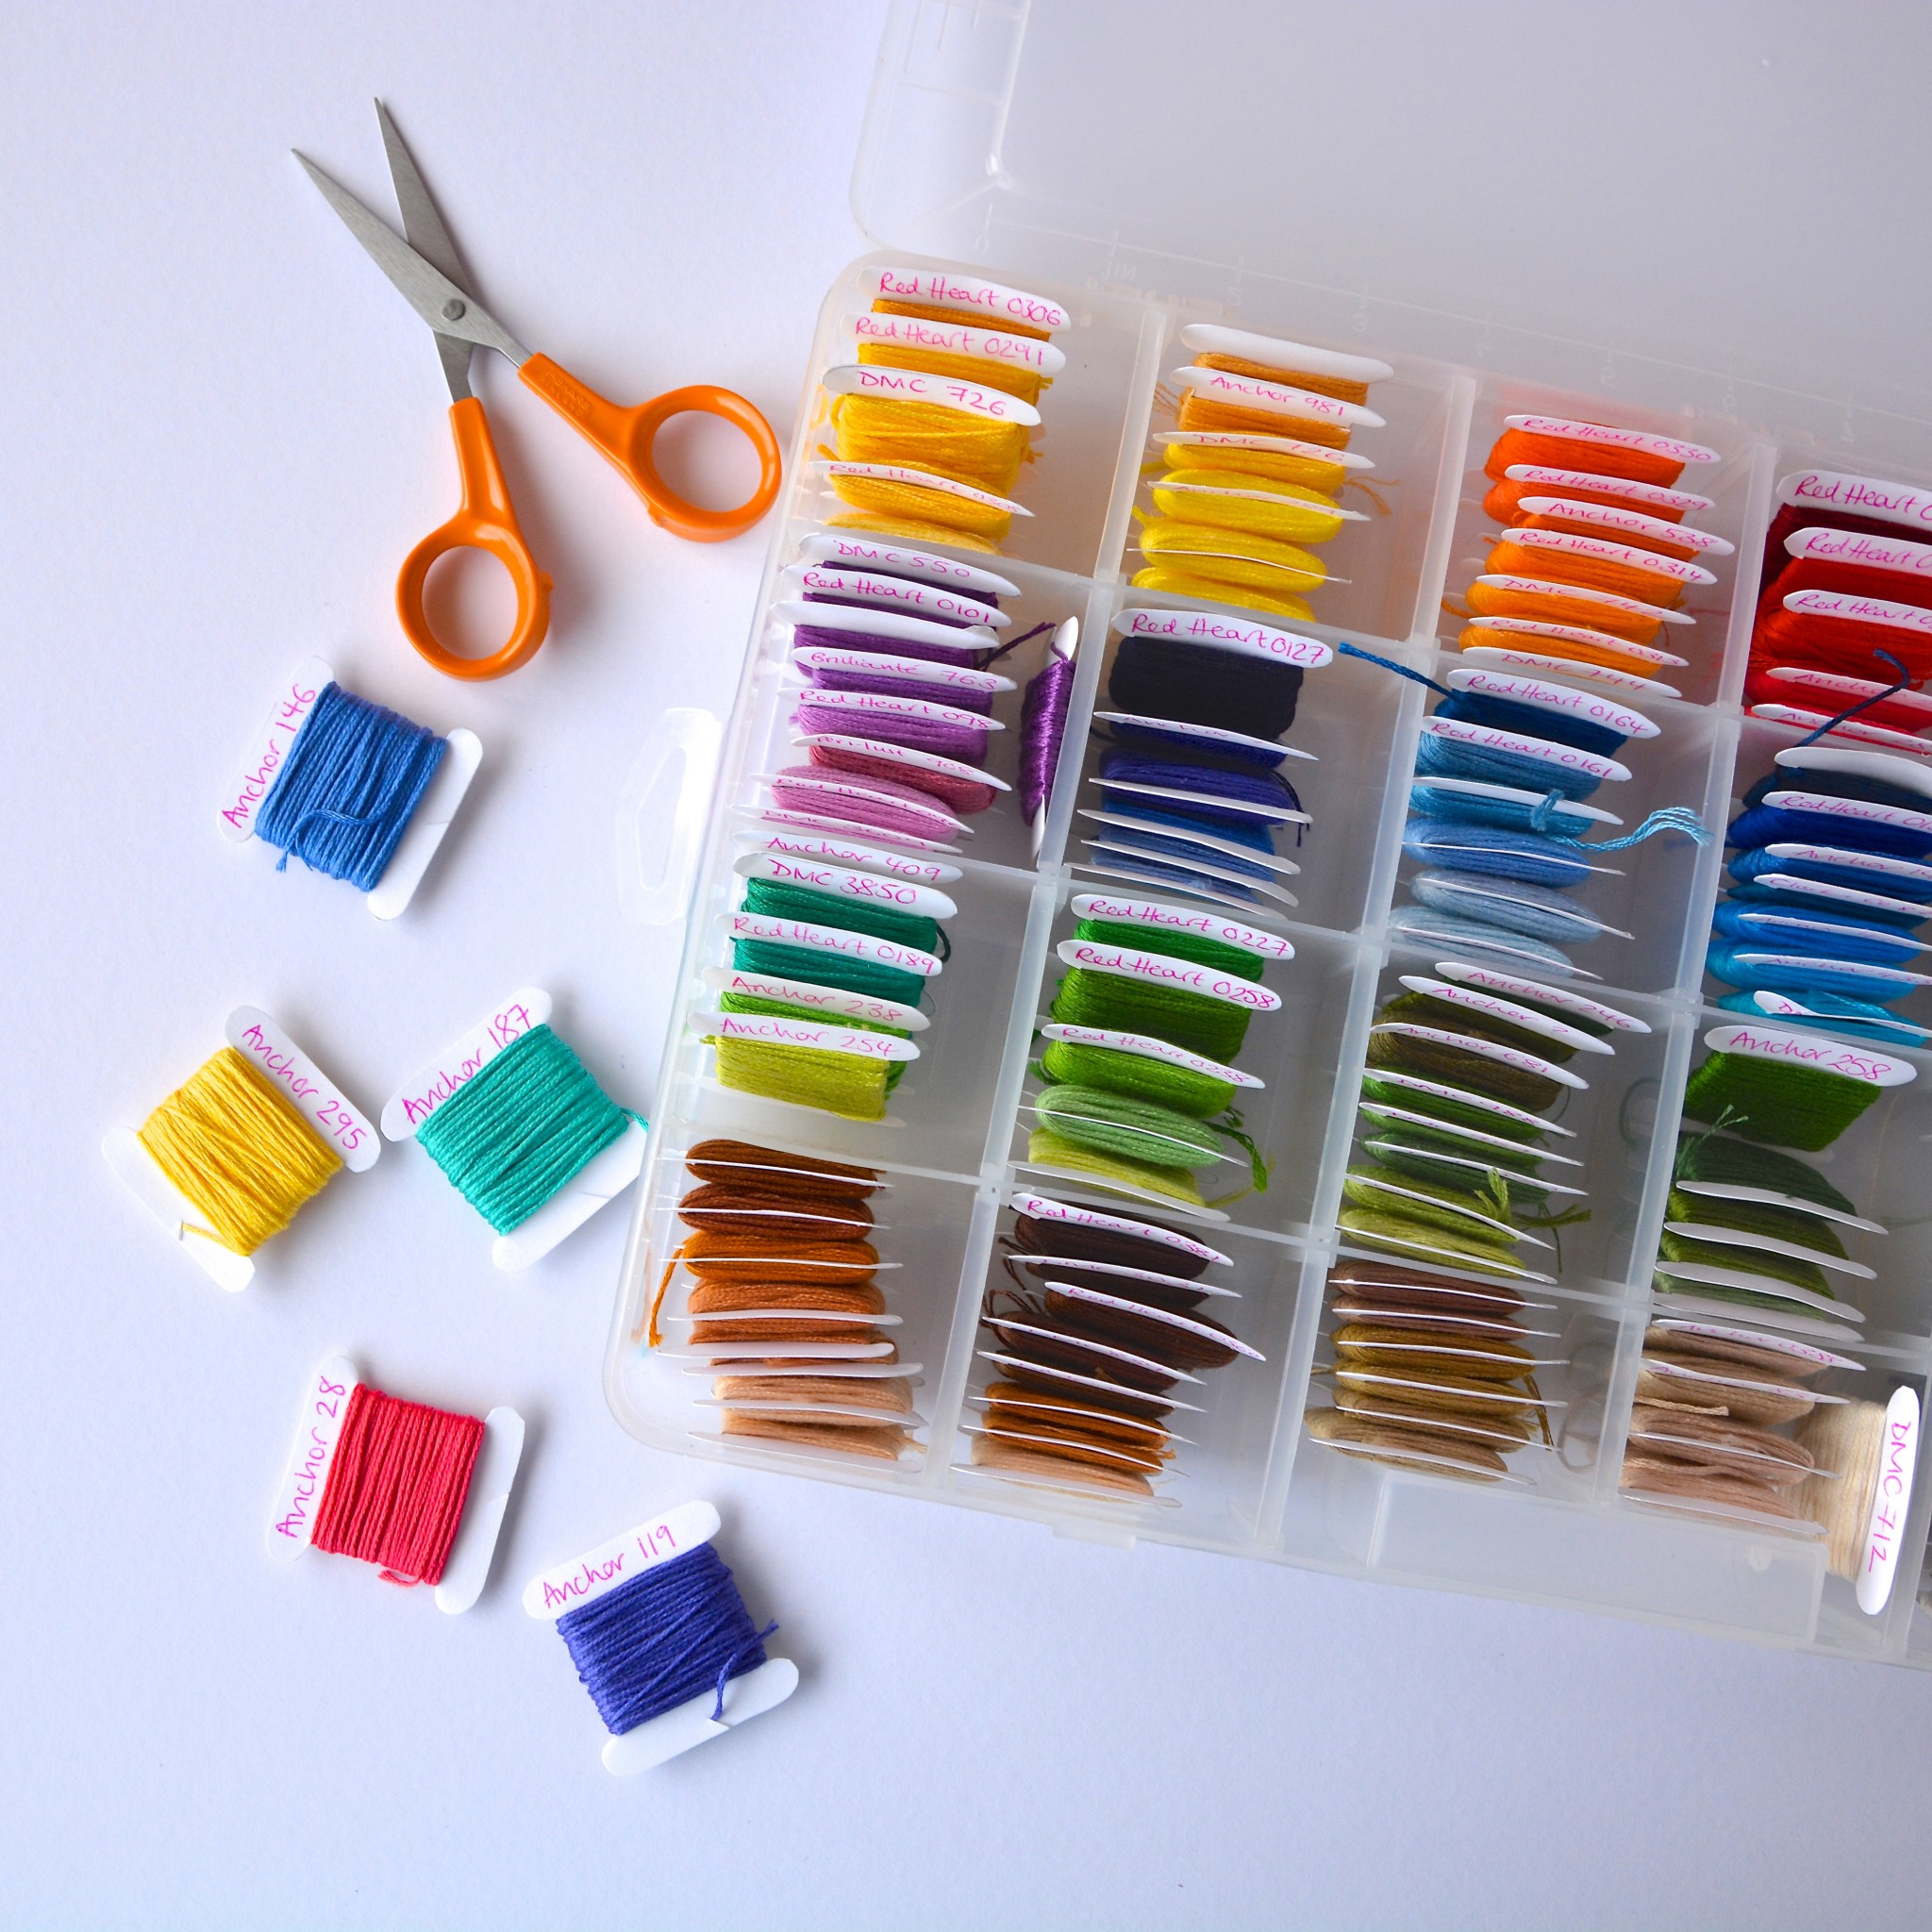 Embroidery thread | Hello! Hooray!